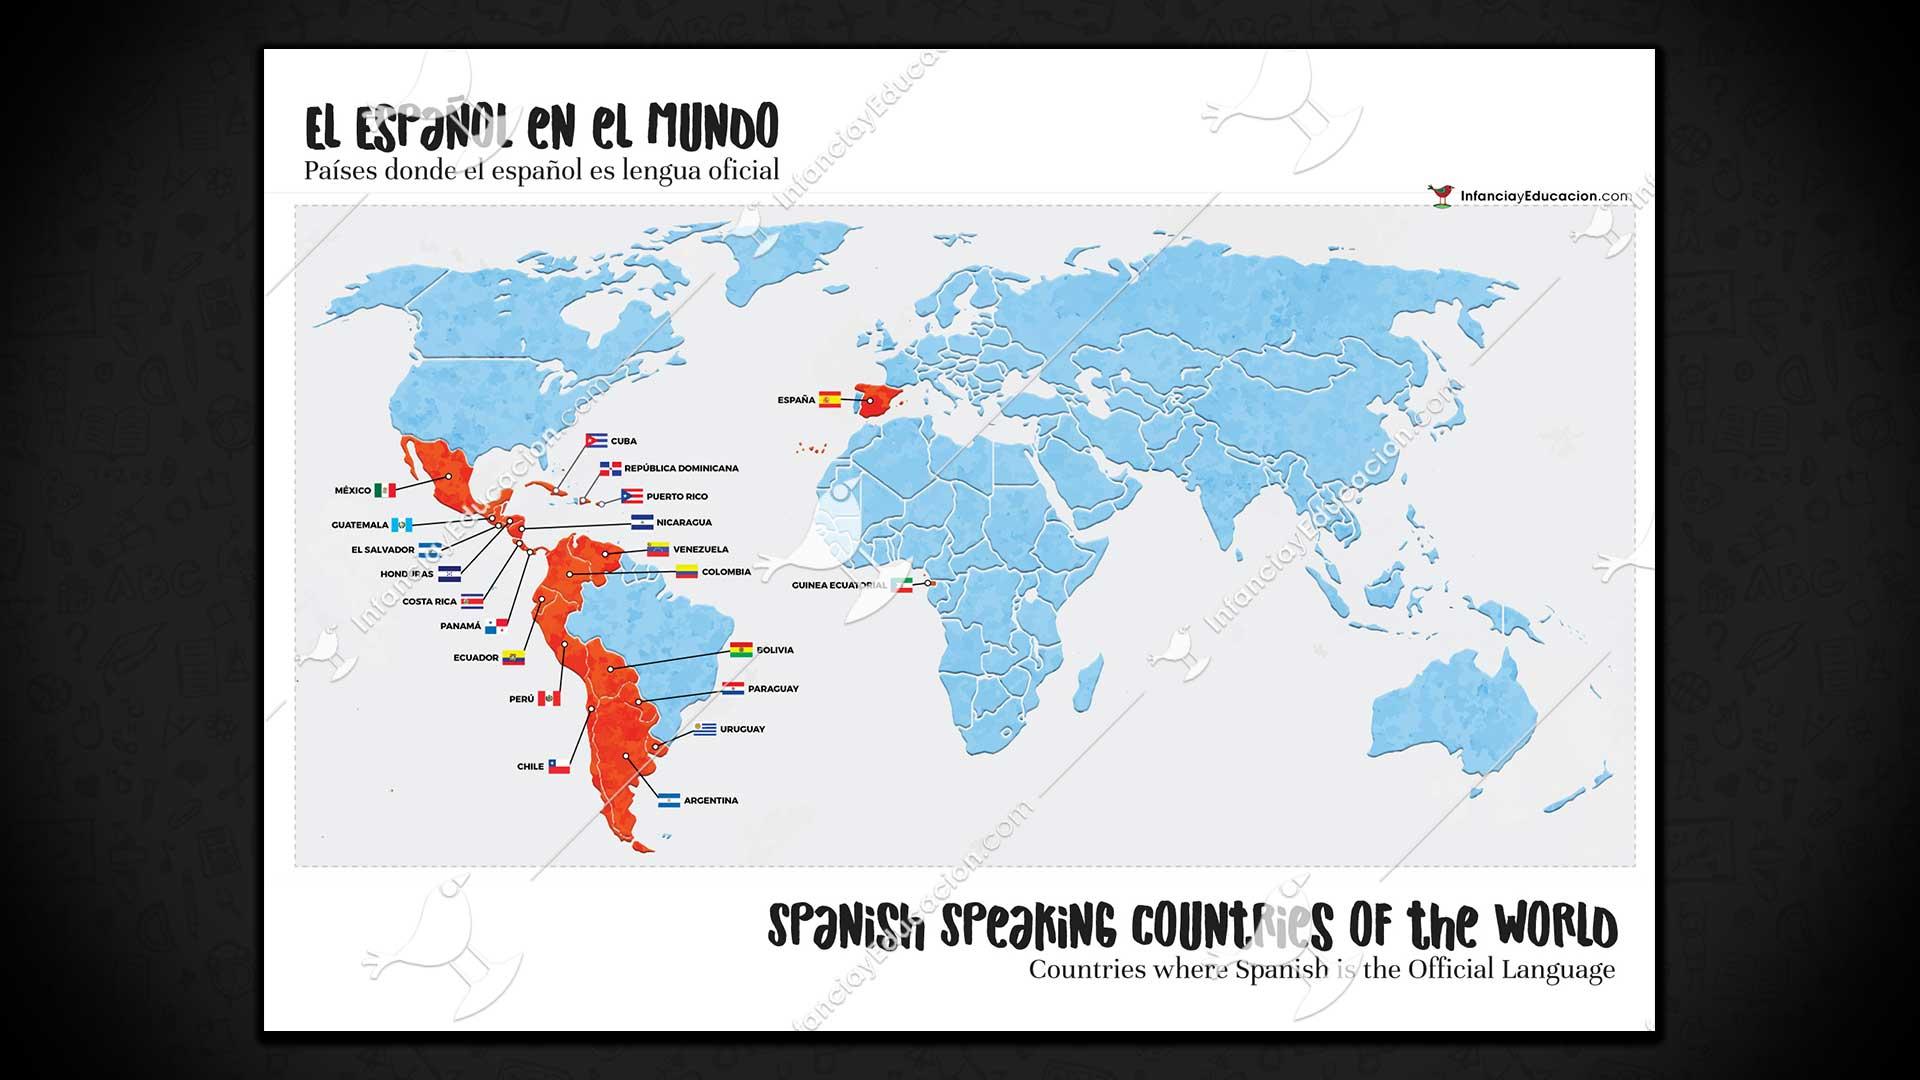 Mapa Del Mundo Paises Hd.Mapa De Los Paises Hispanohablantes Spanish Speaking Countries Map